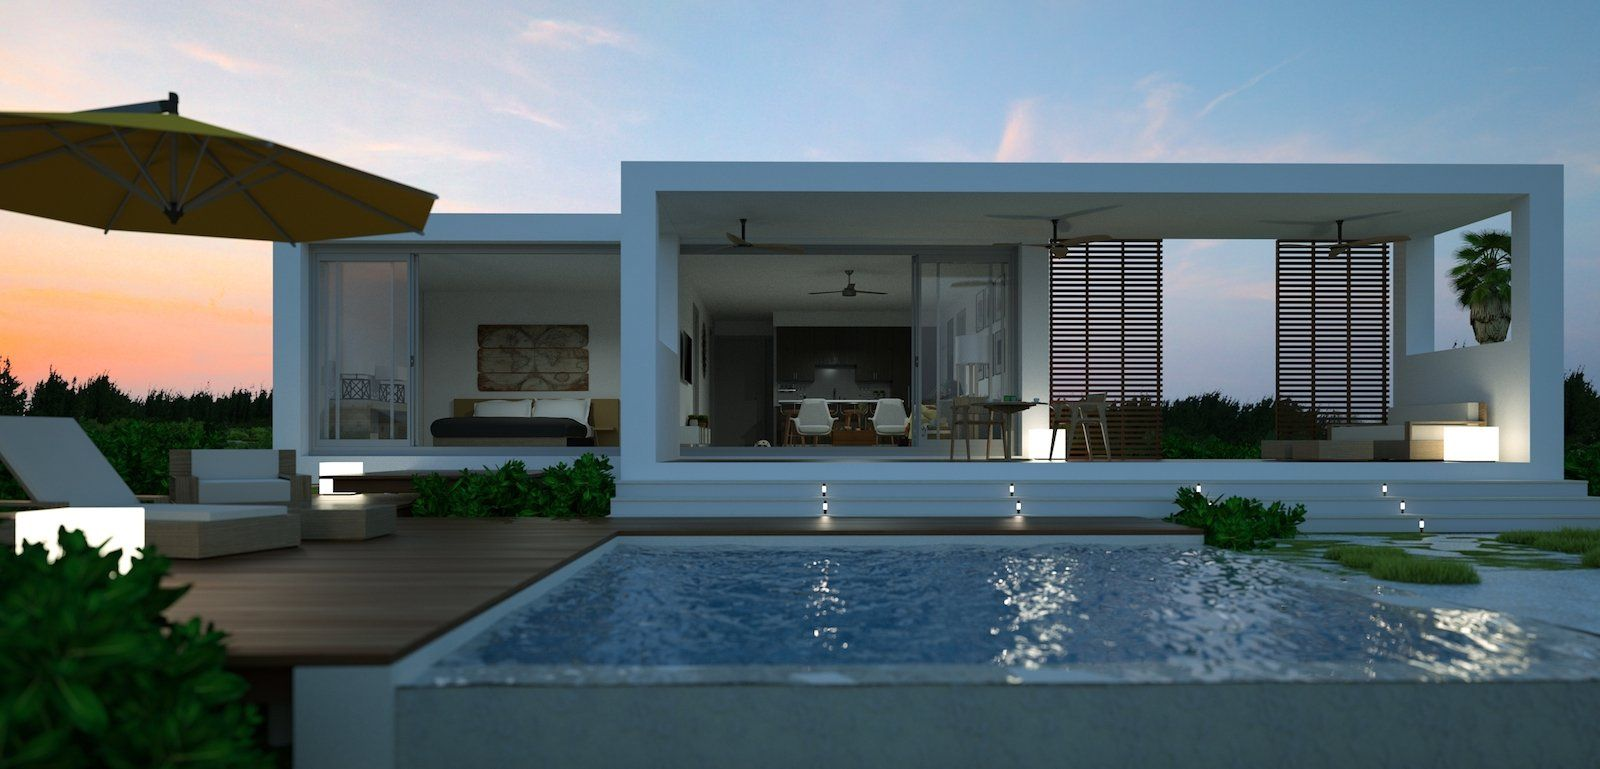 These Modular Hurricane Proof Homes Cost Less Than 200 000 To Build Prefab Homes Florida Florida Home Prefab Modular Homes